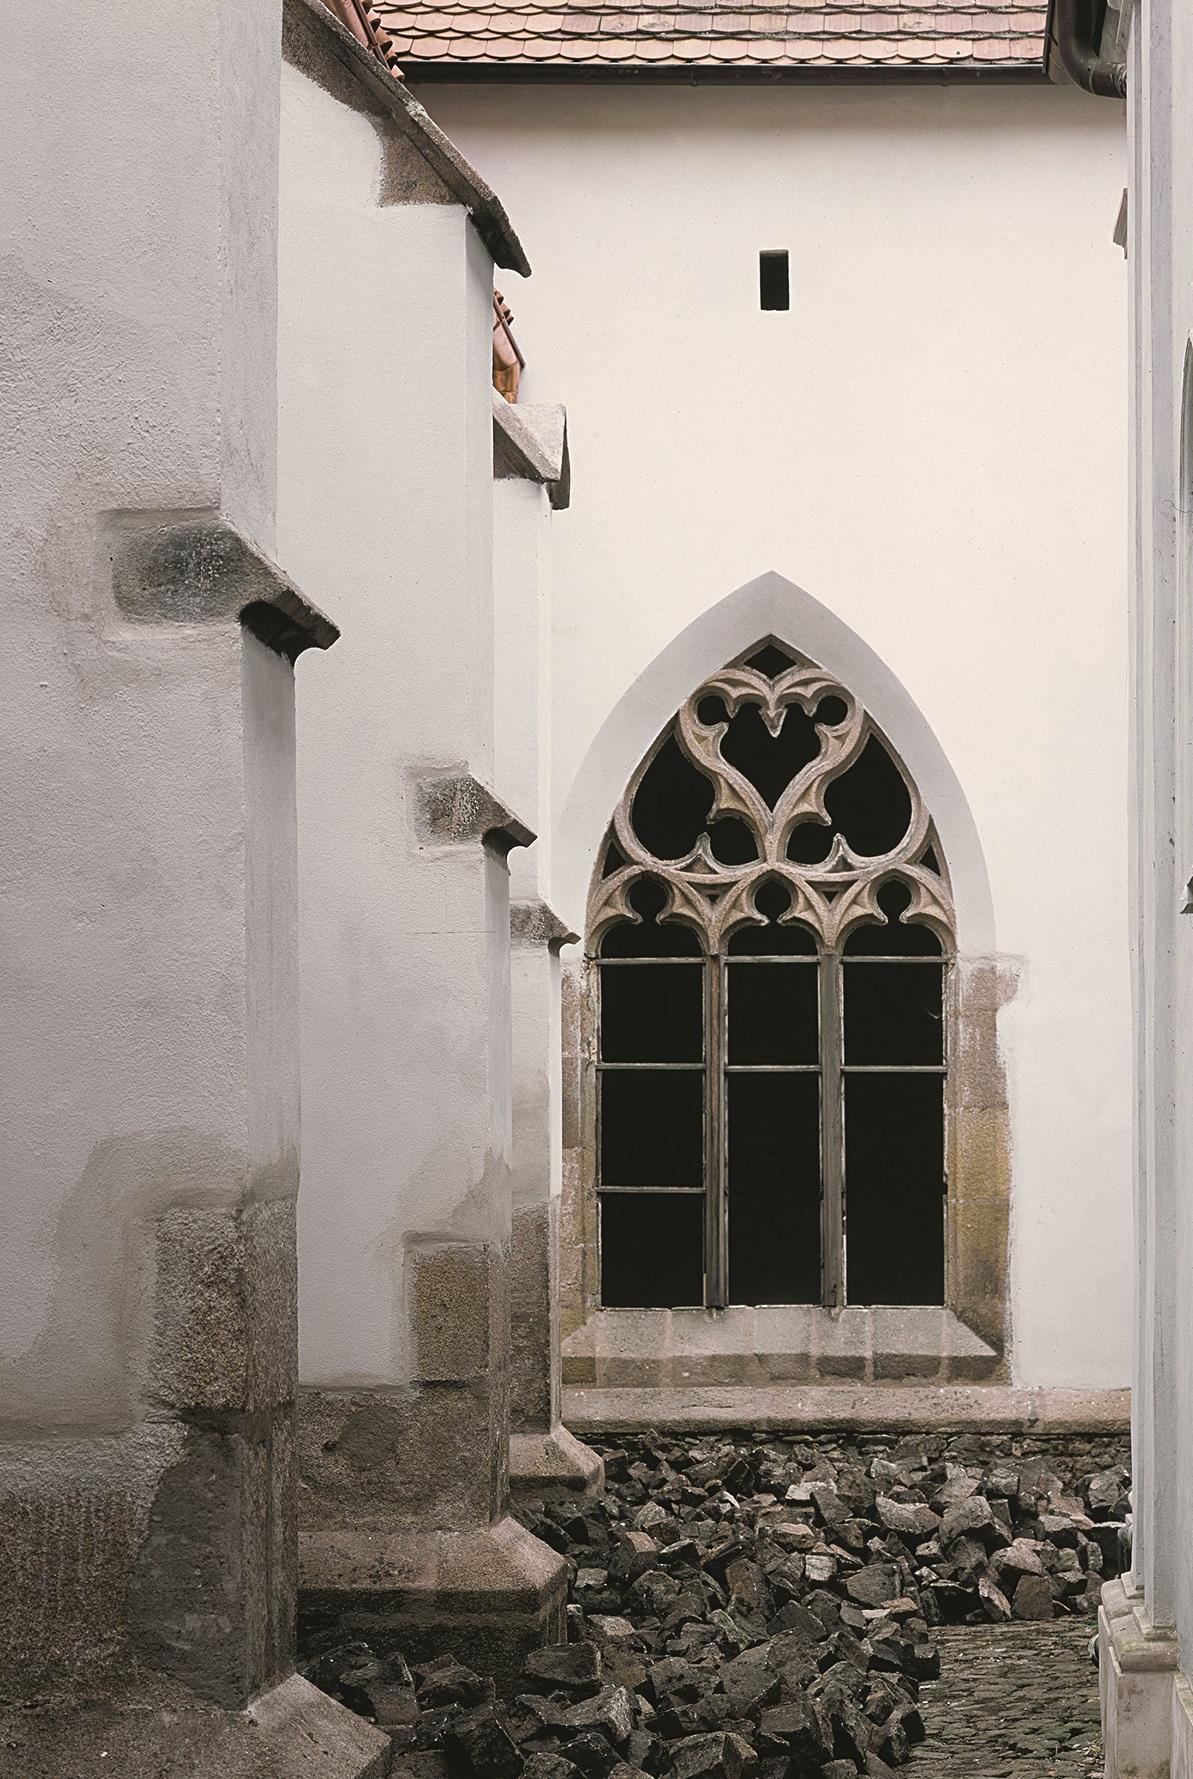 Ambit kláštera minoritů